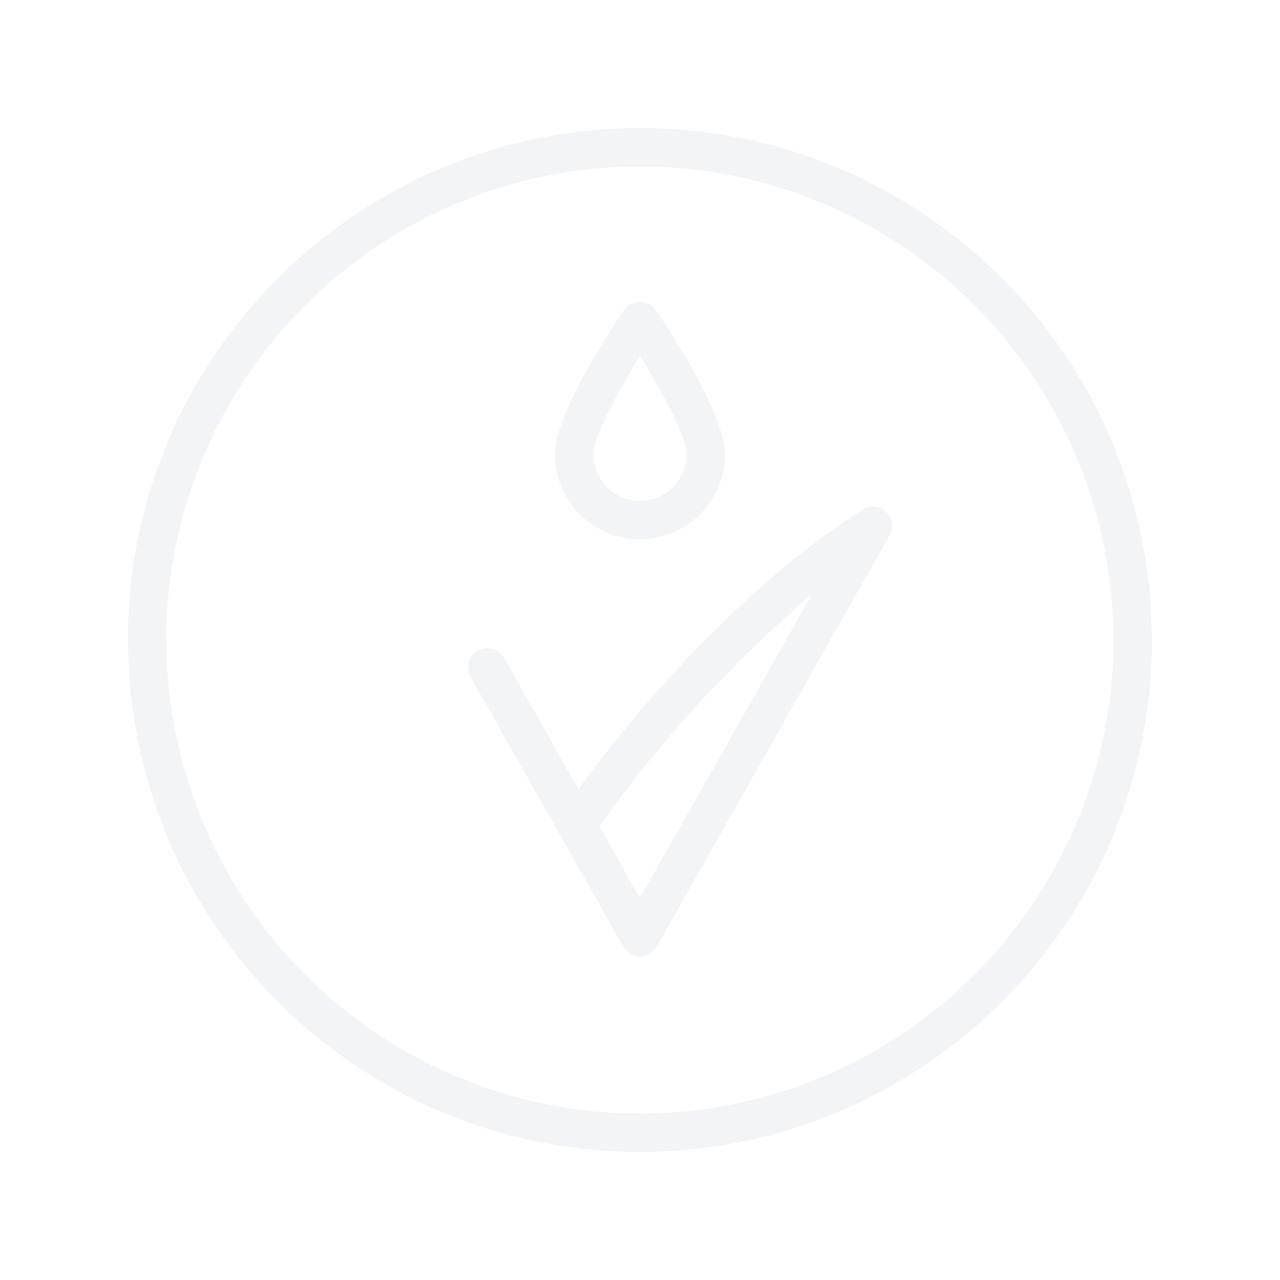 ALESSANDRO Pedix Feet Heel Smoothing Stick 50g